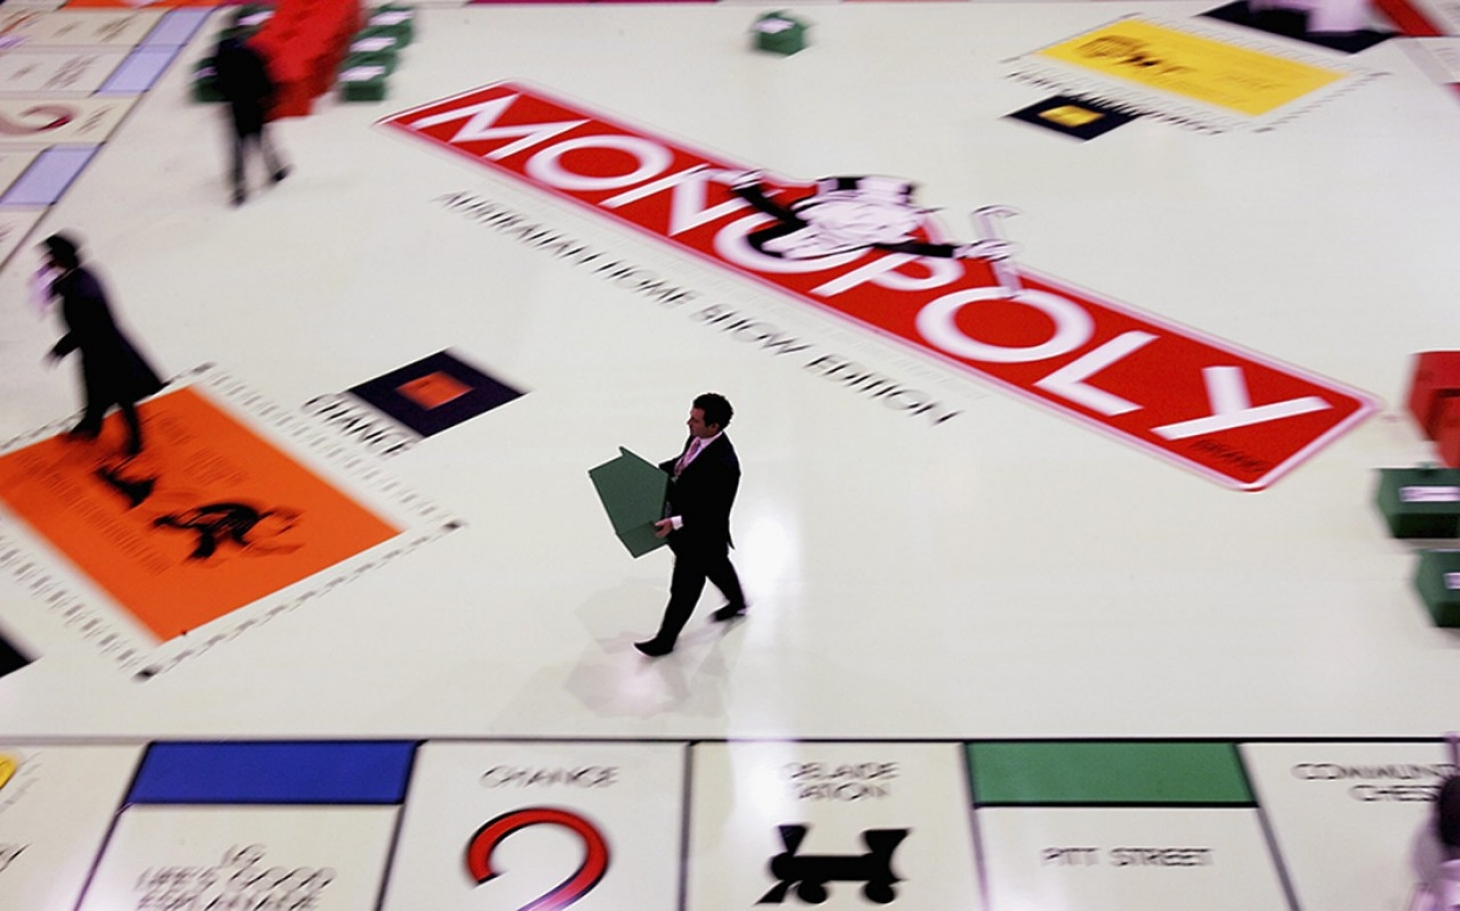 Back to the future with monopoly capitalism | Al Jazeera America